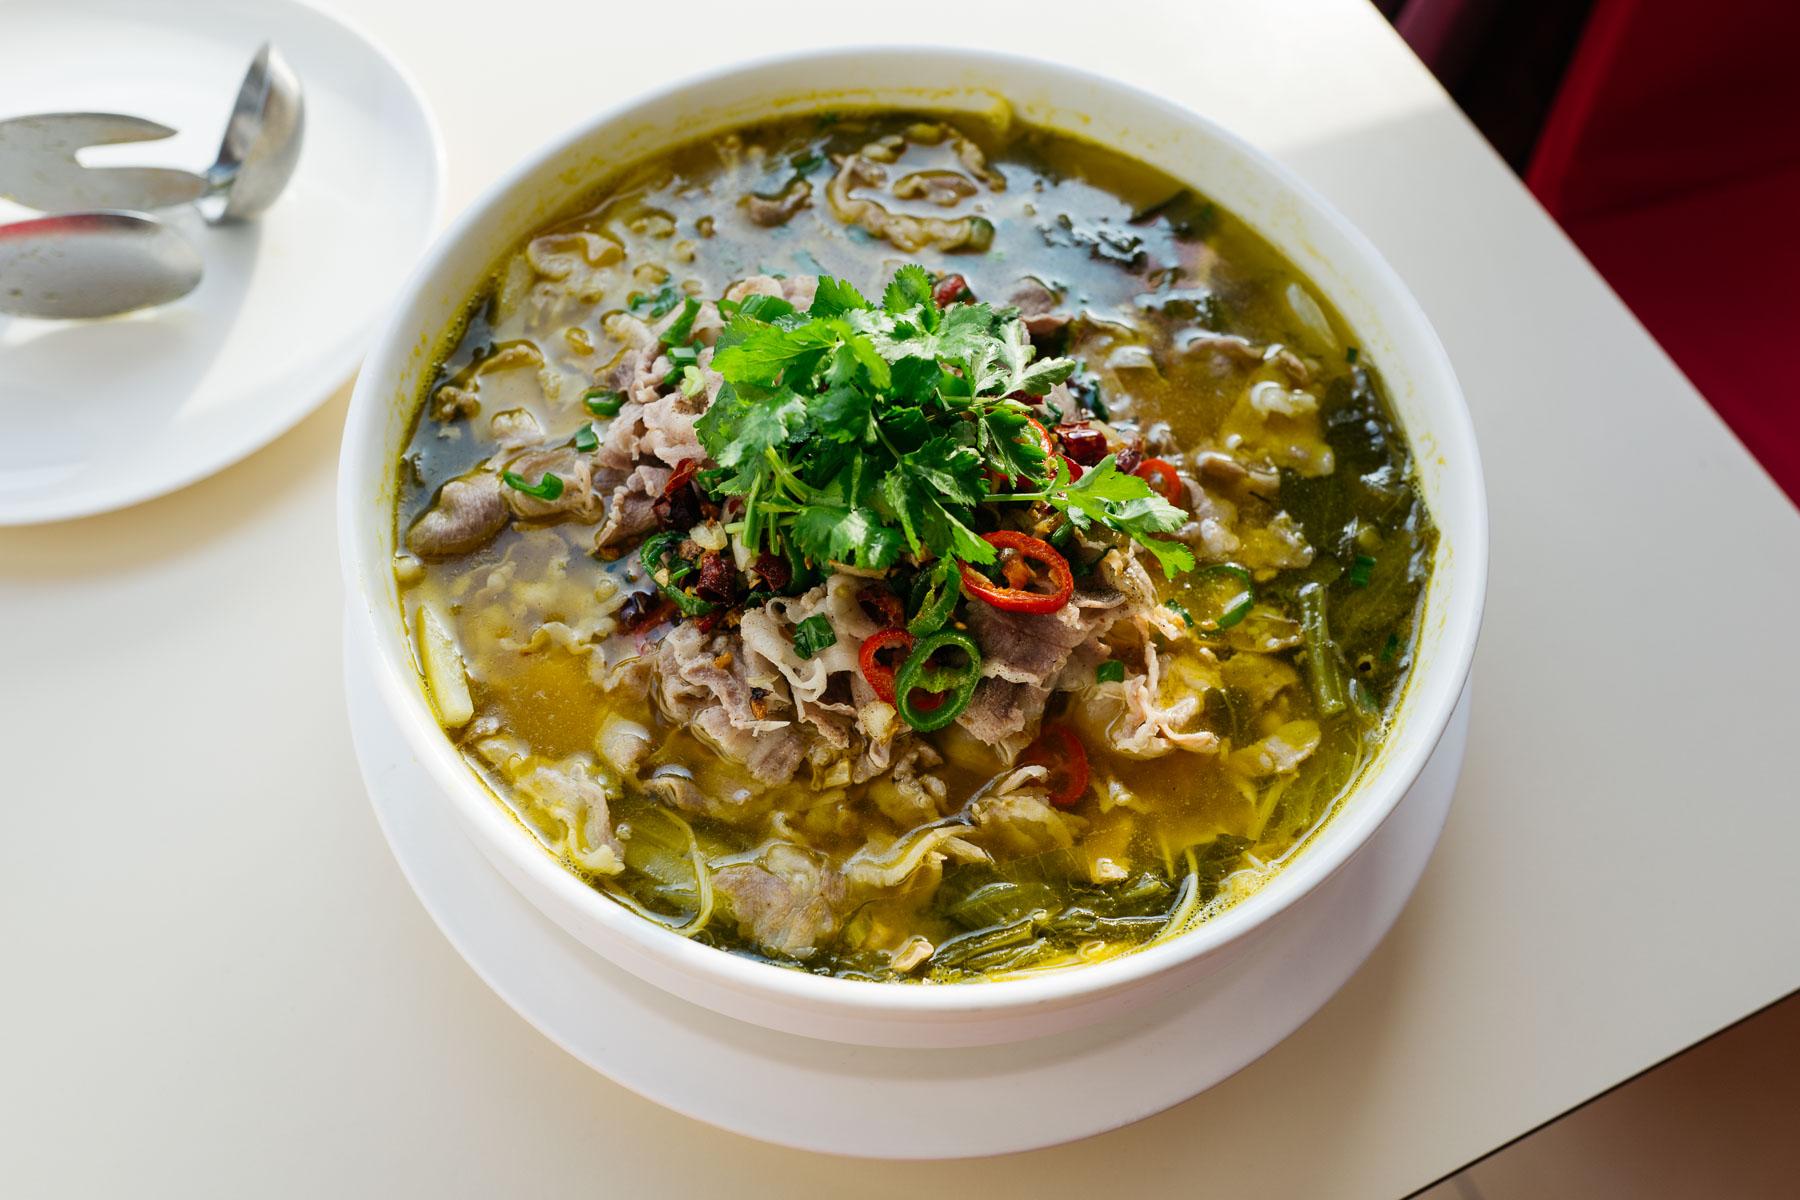 Baranina z kiszonymi warzywami i makaronem (jin tang yang rou, 金汤羊肉)